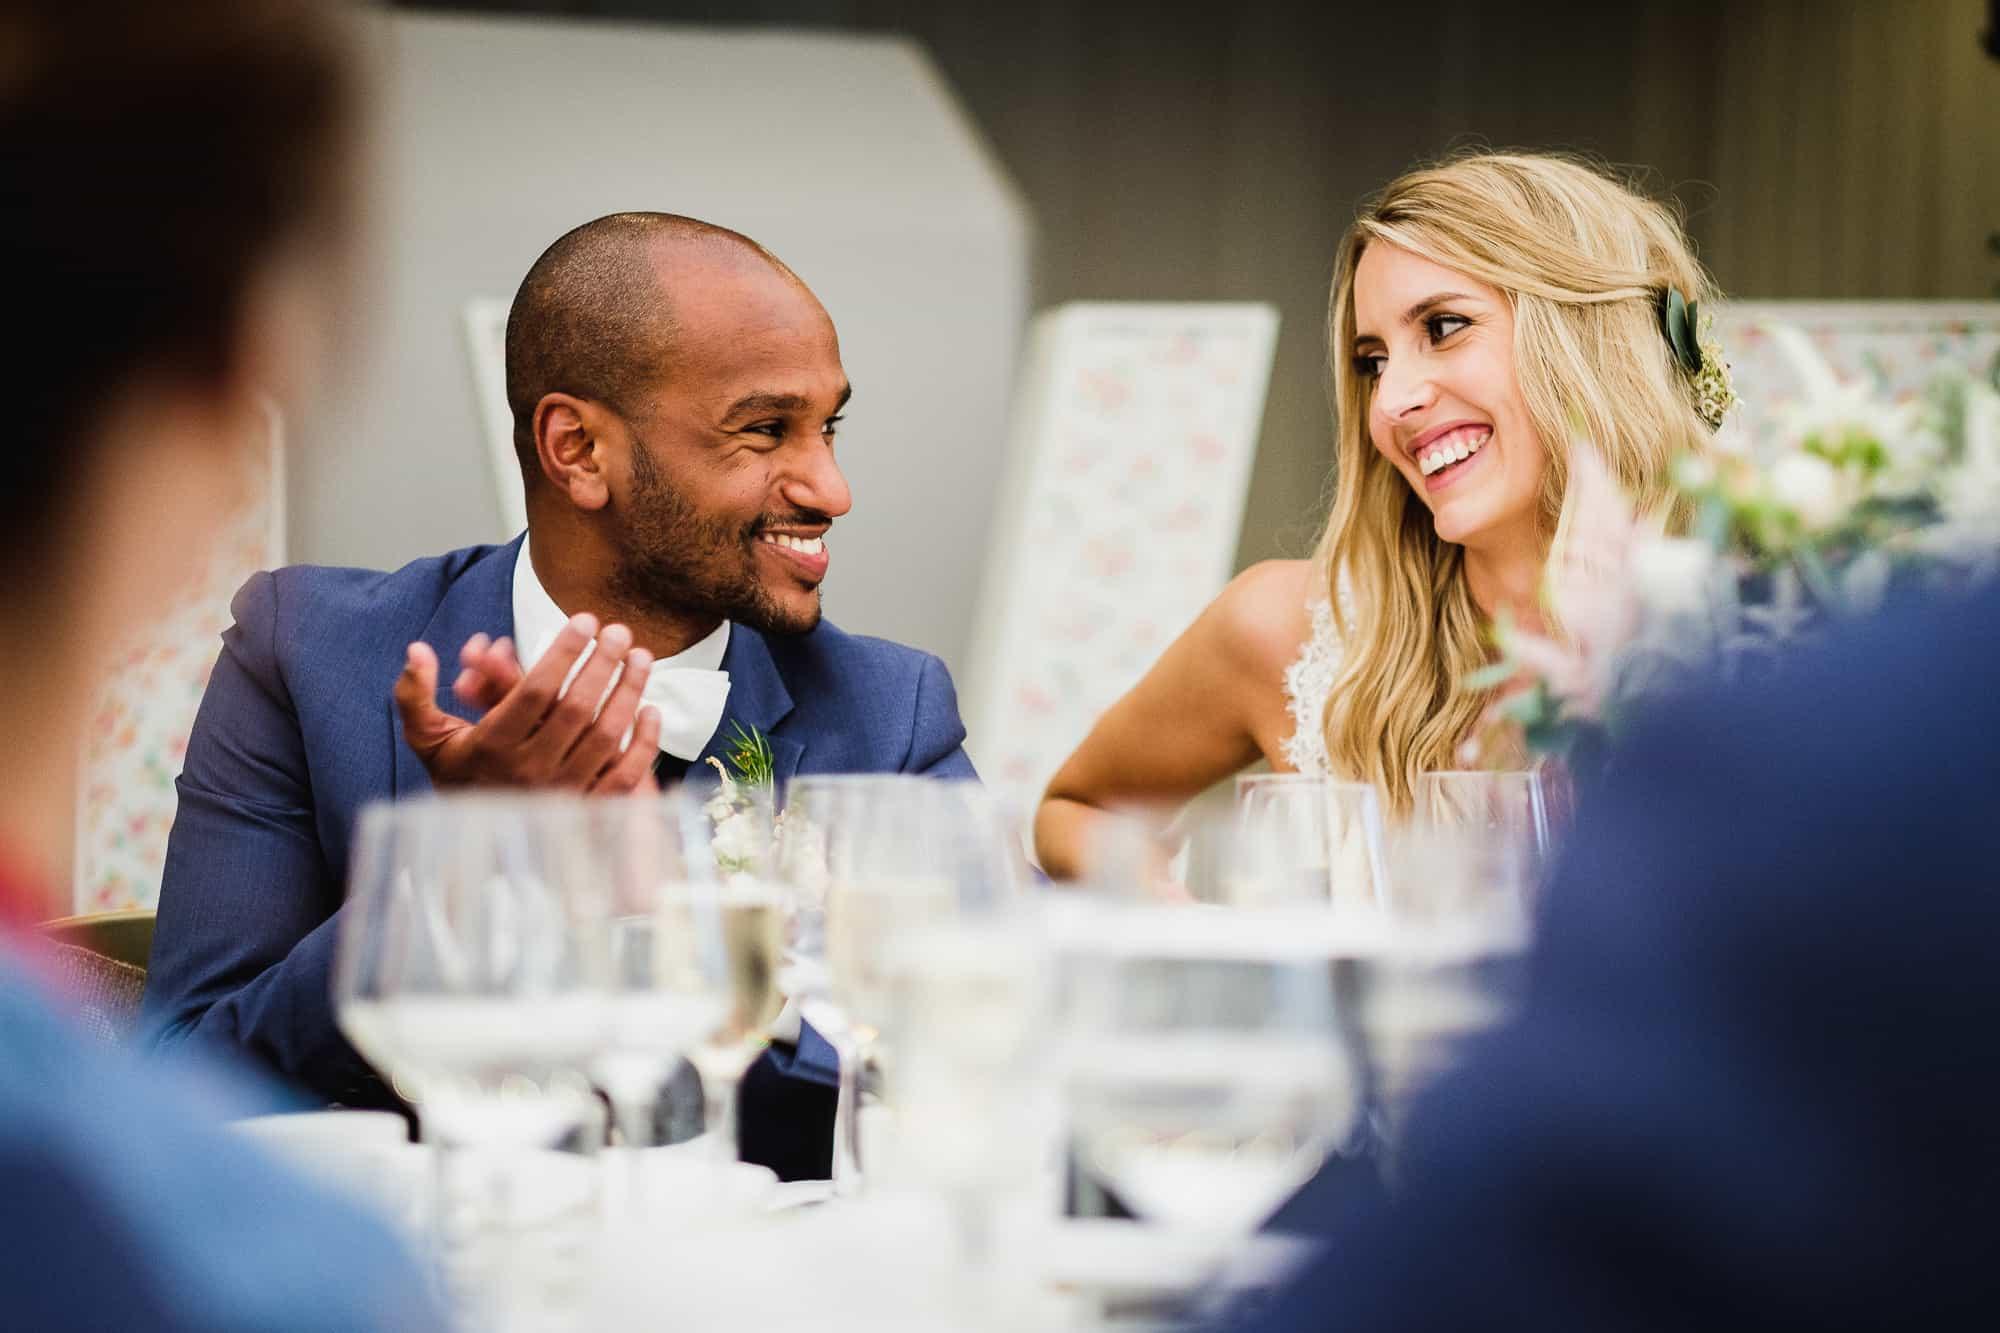 marleybrook-house-wedding-photography-matt-tyler-0053